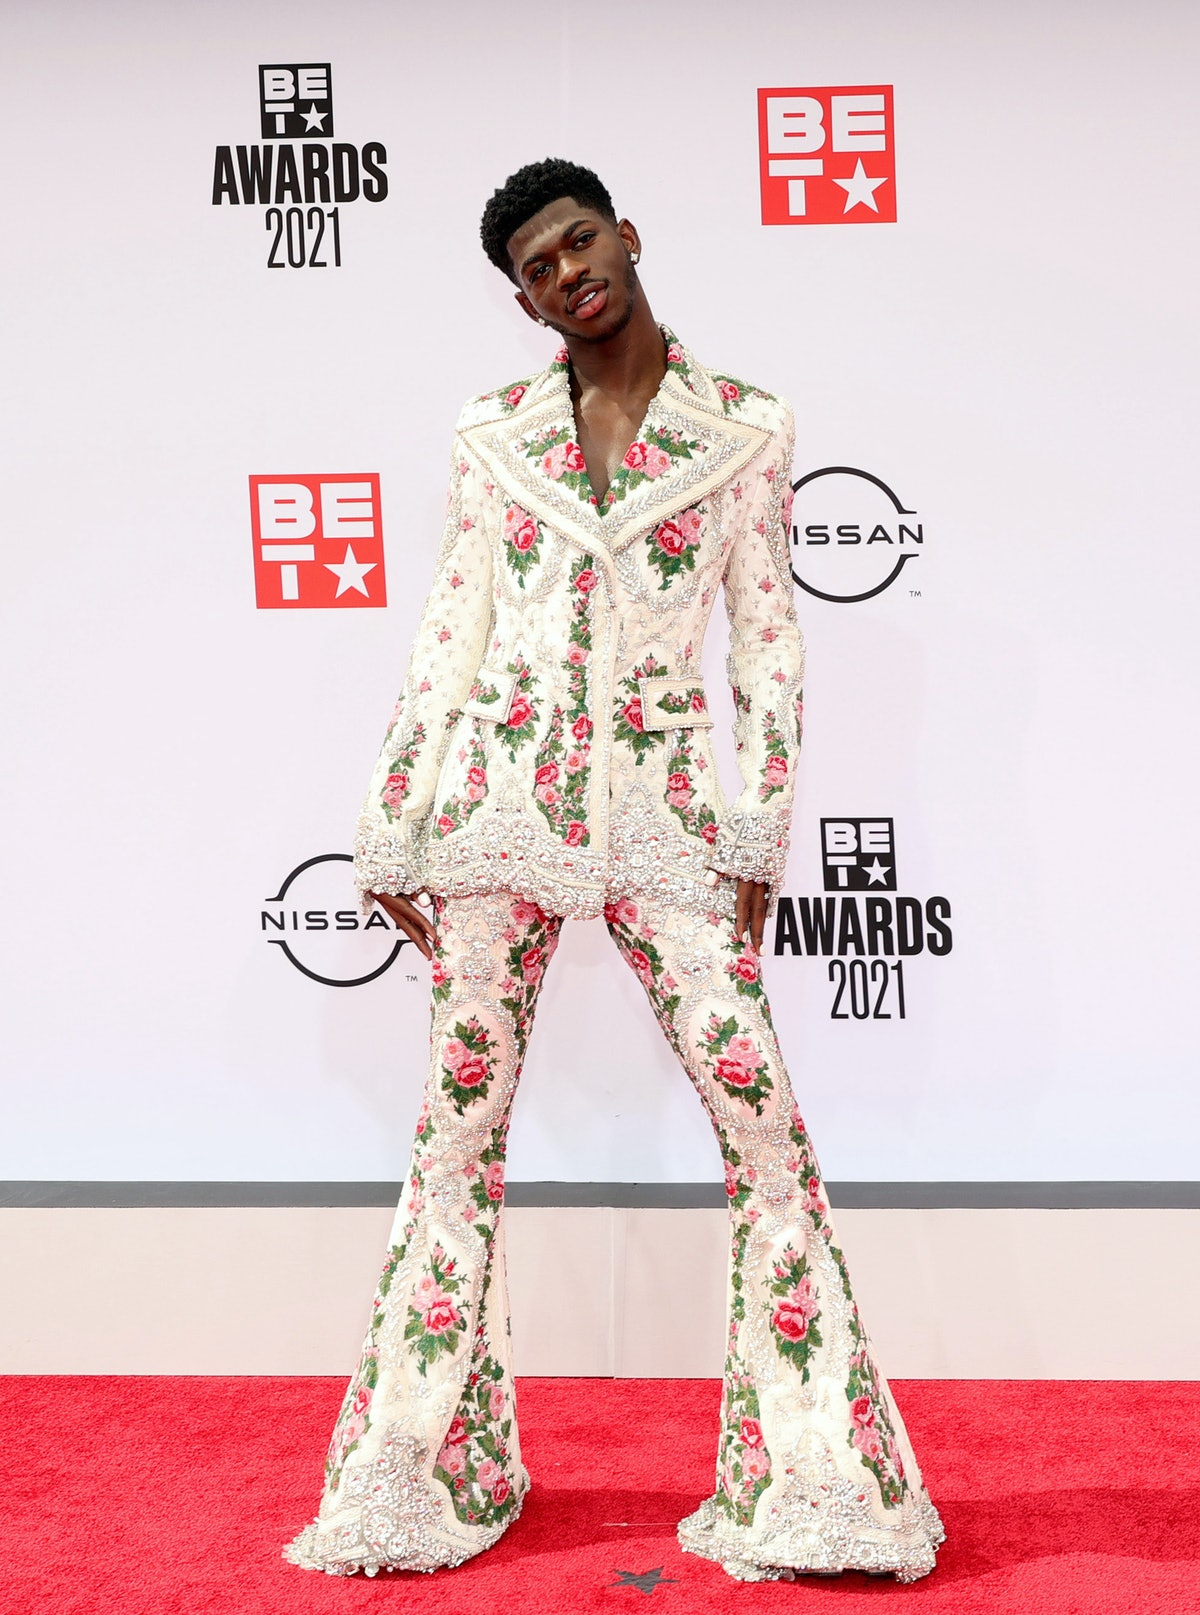 Lil Nas X at the 2021 BET Awards